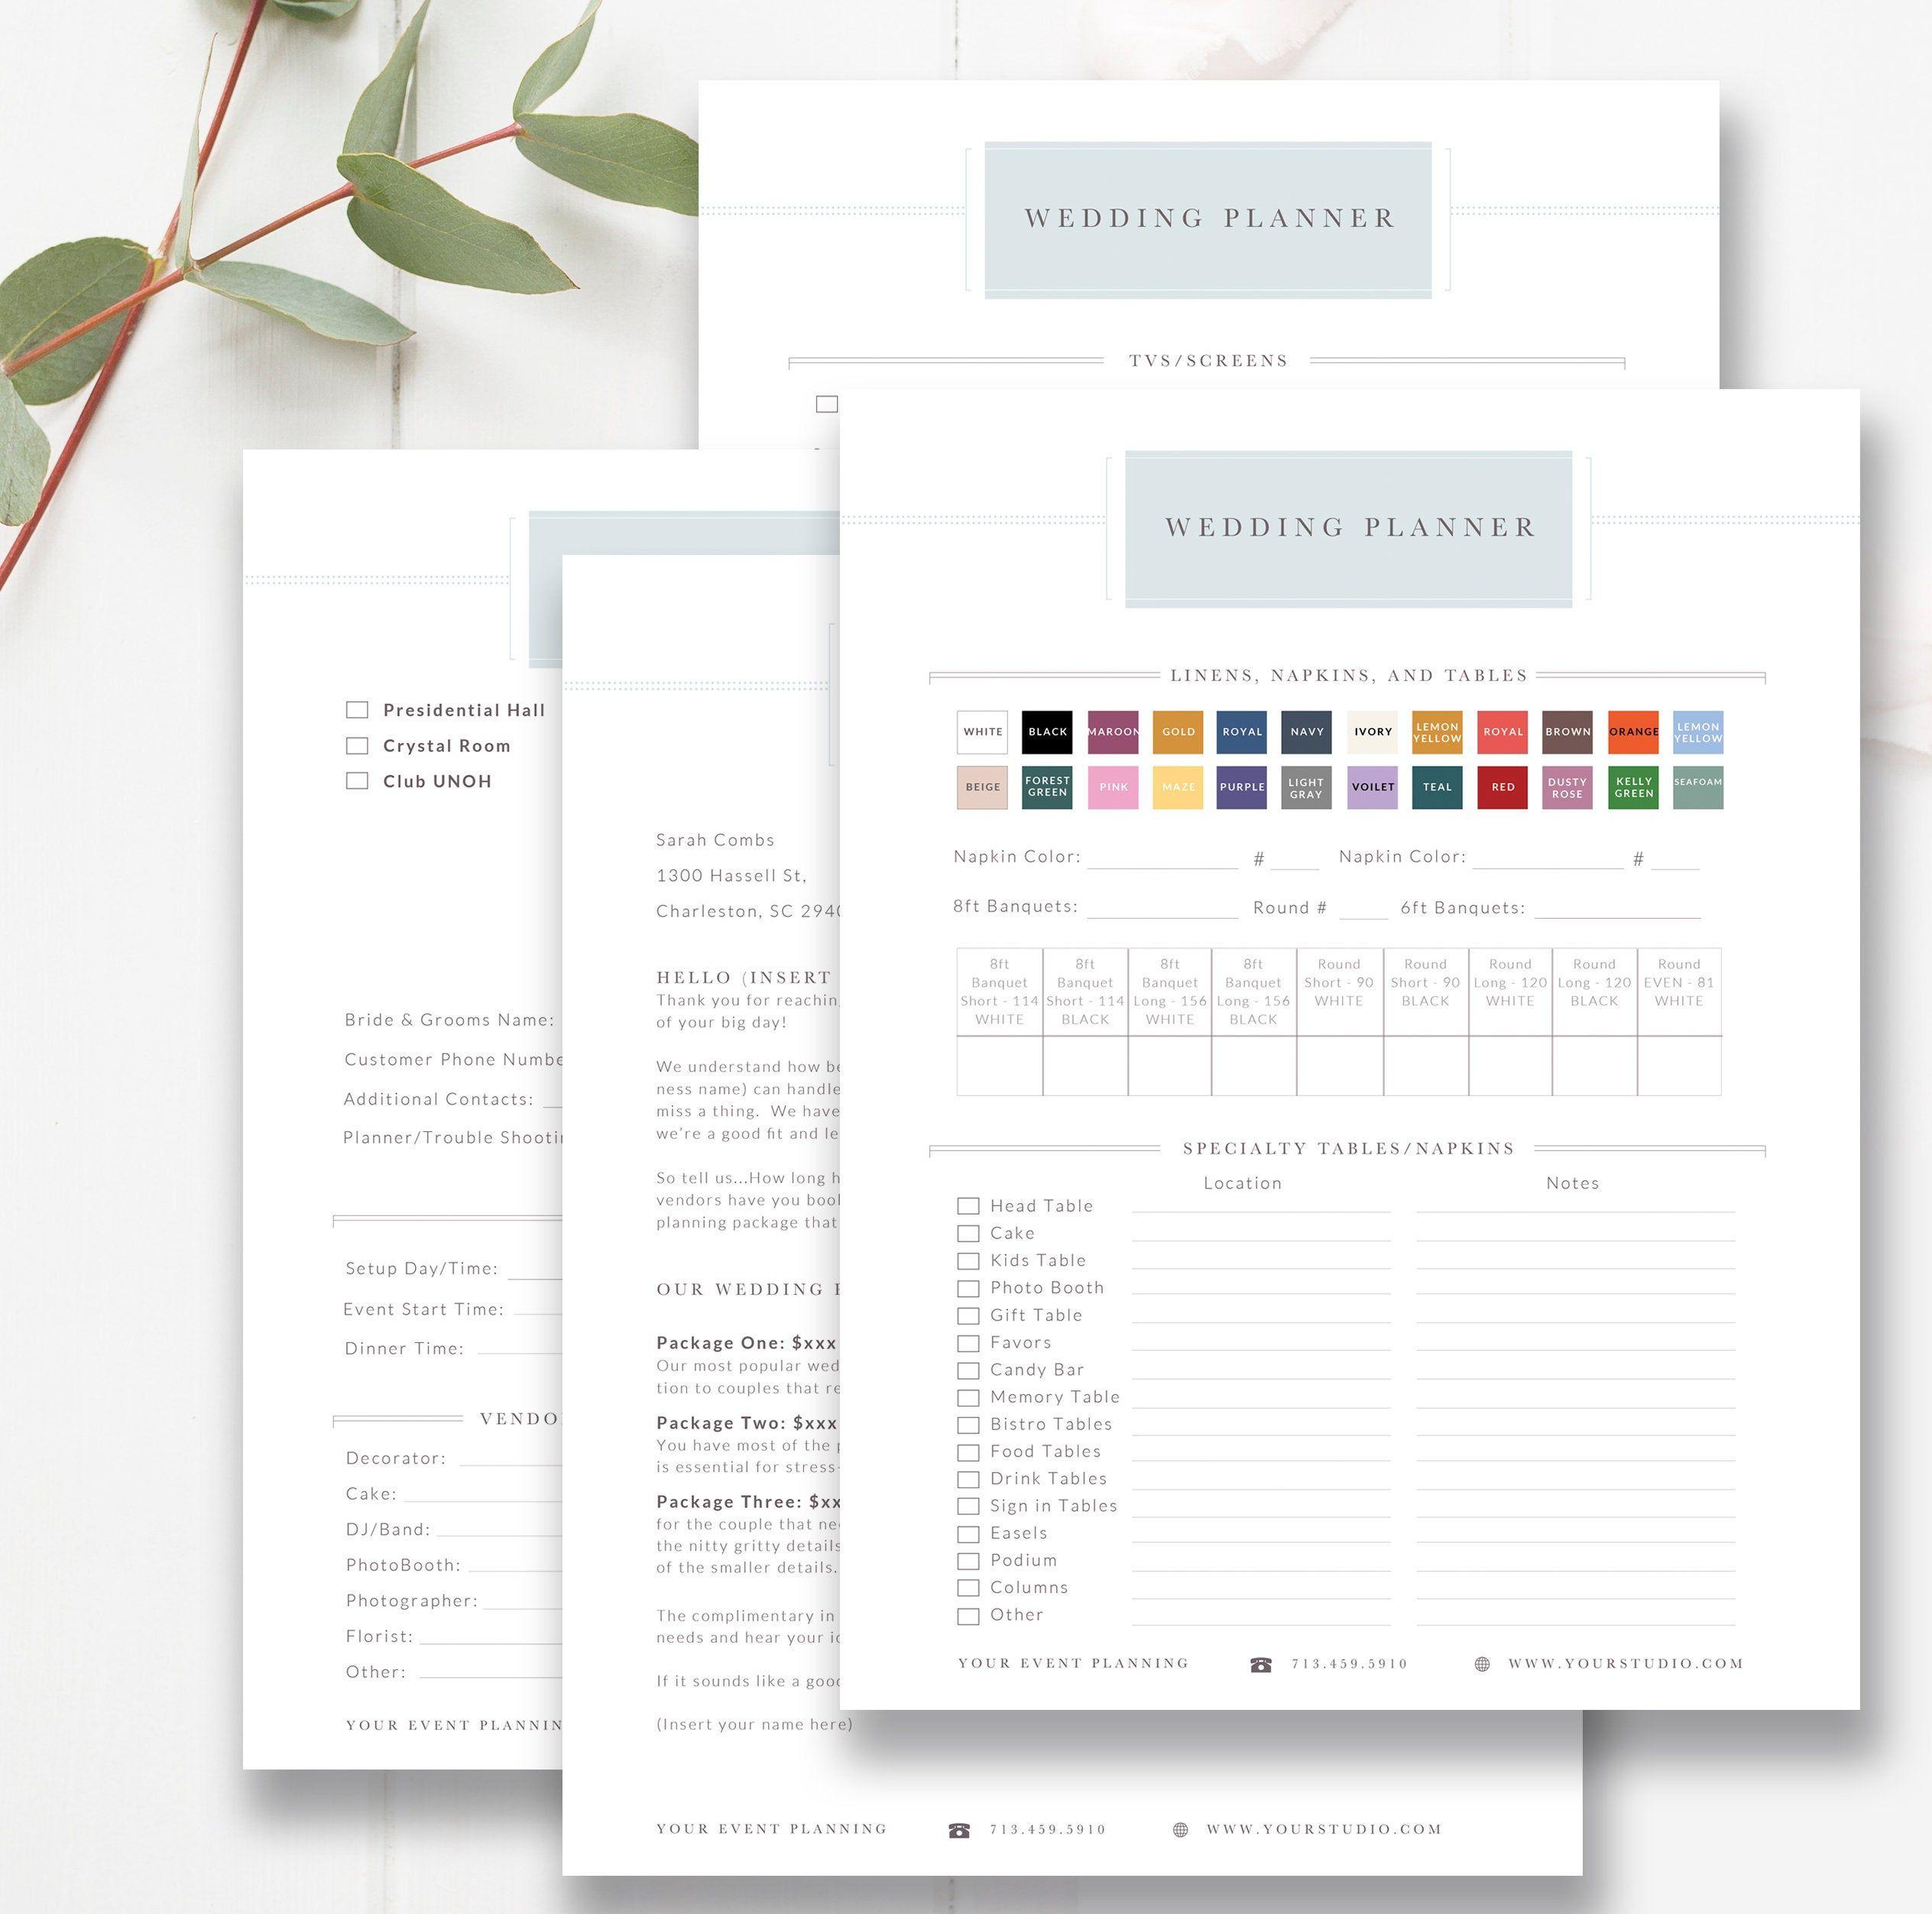 Wedding Planner Client Questionnaire, Wedding Planning